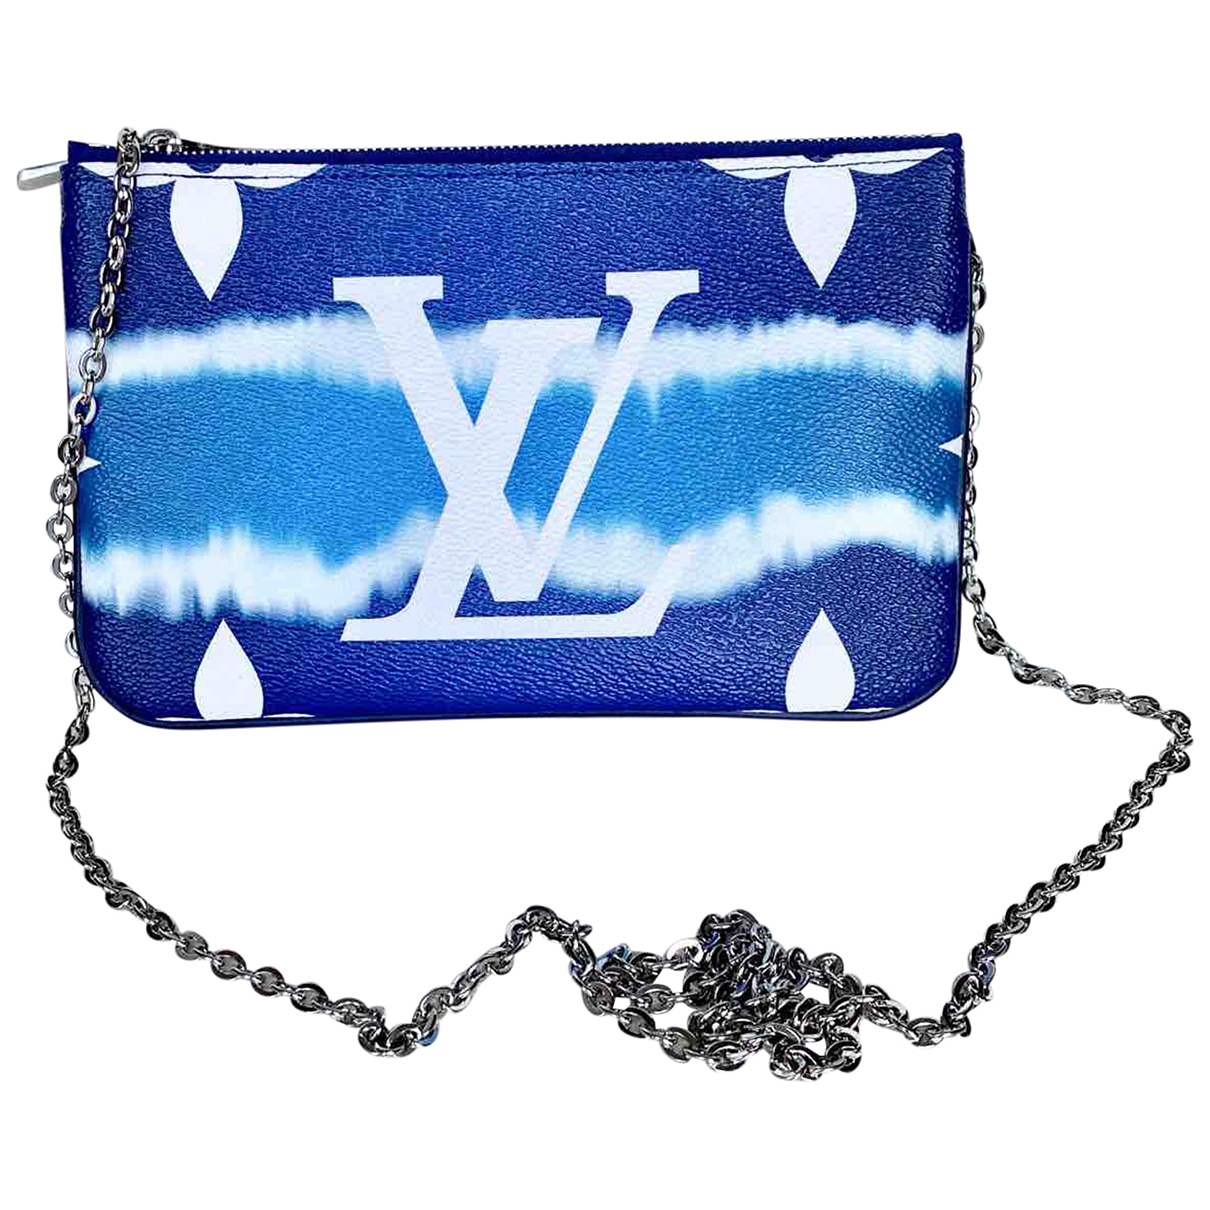 Louis Vuitton Double zip Clutch in  Blau Leinen